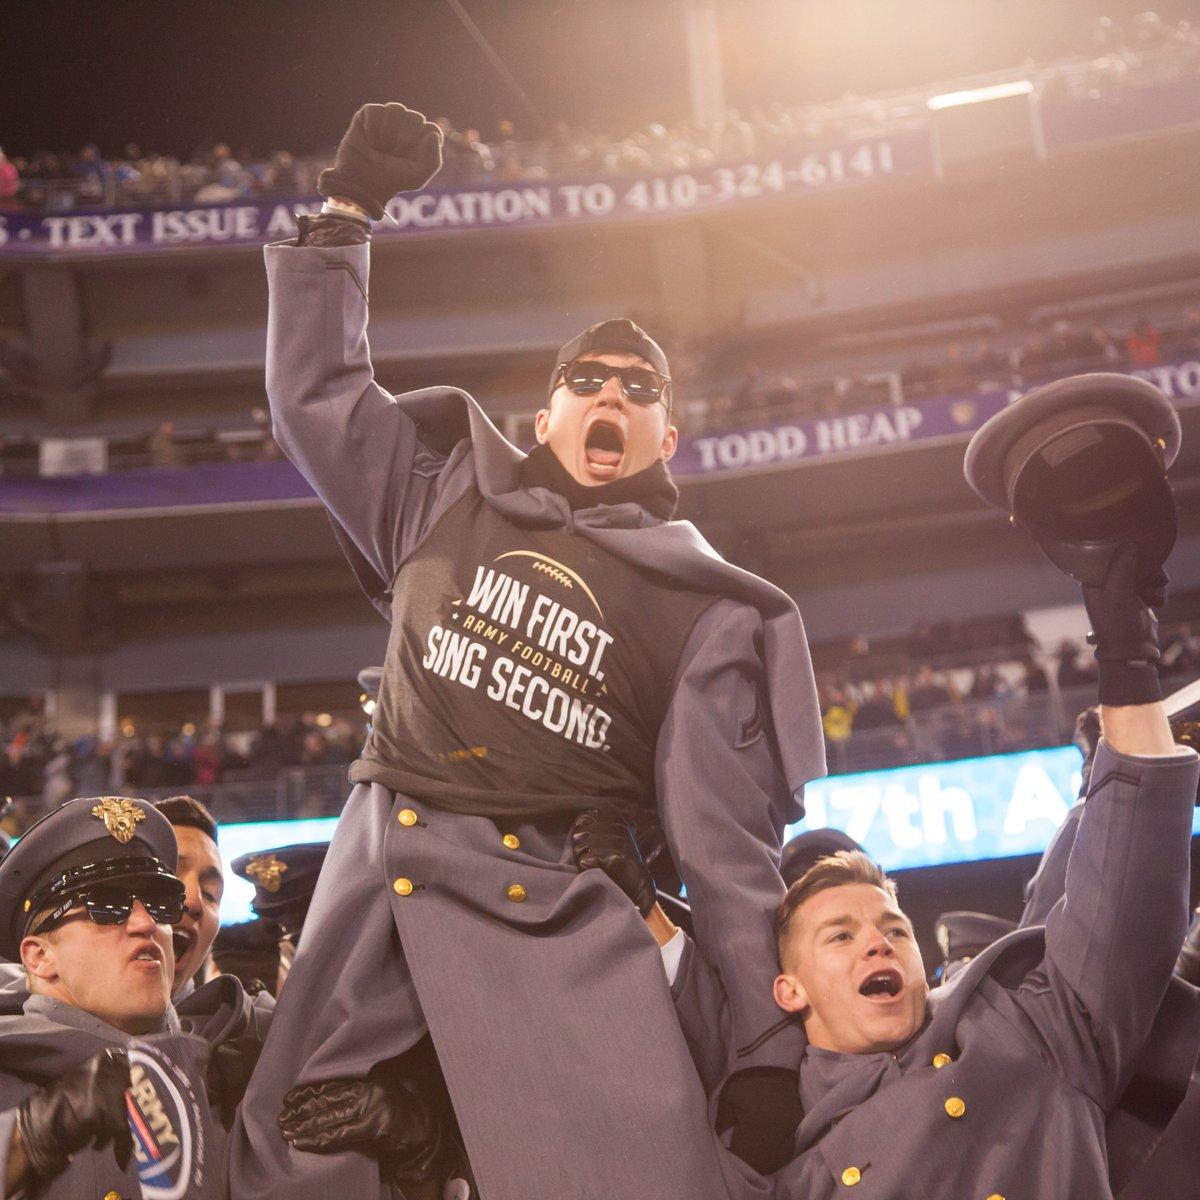 Congratulations, @ArmyWP_Football !! We did it!!! #GoArmy #BeatNavy #SingSecond https://t.co/nHu1uJkjAz